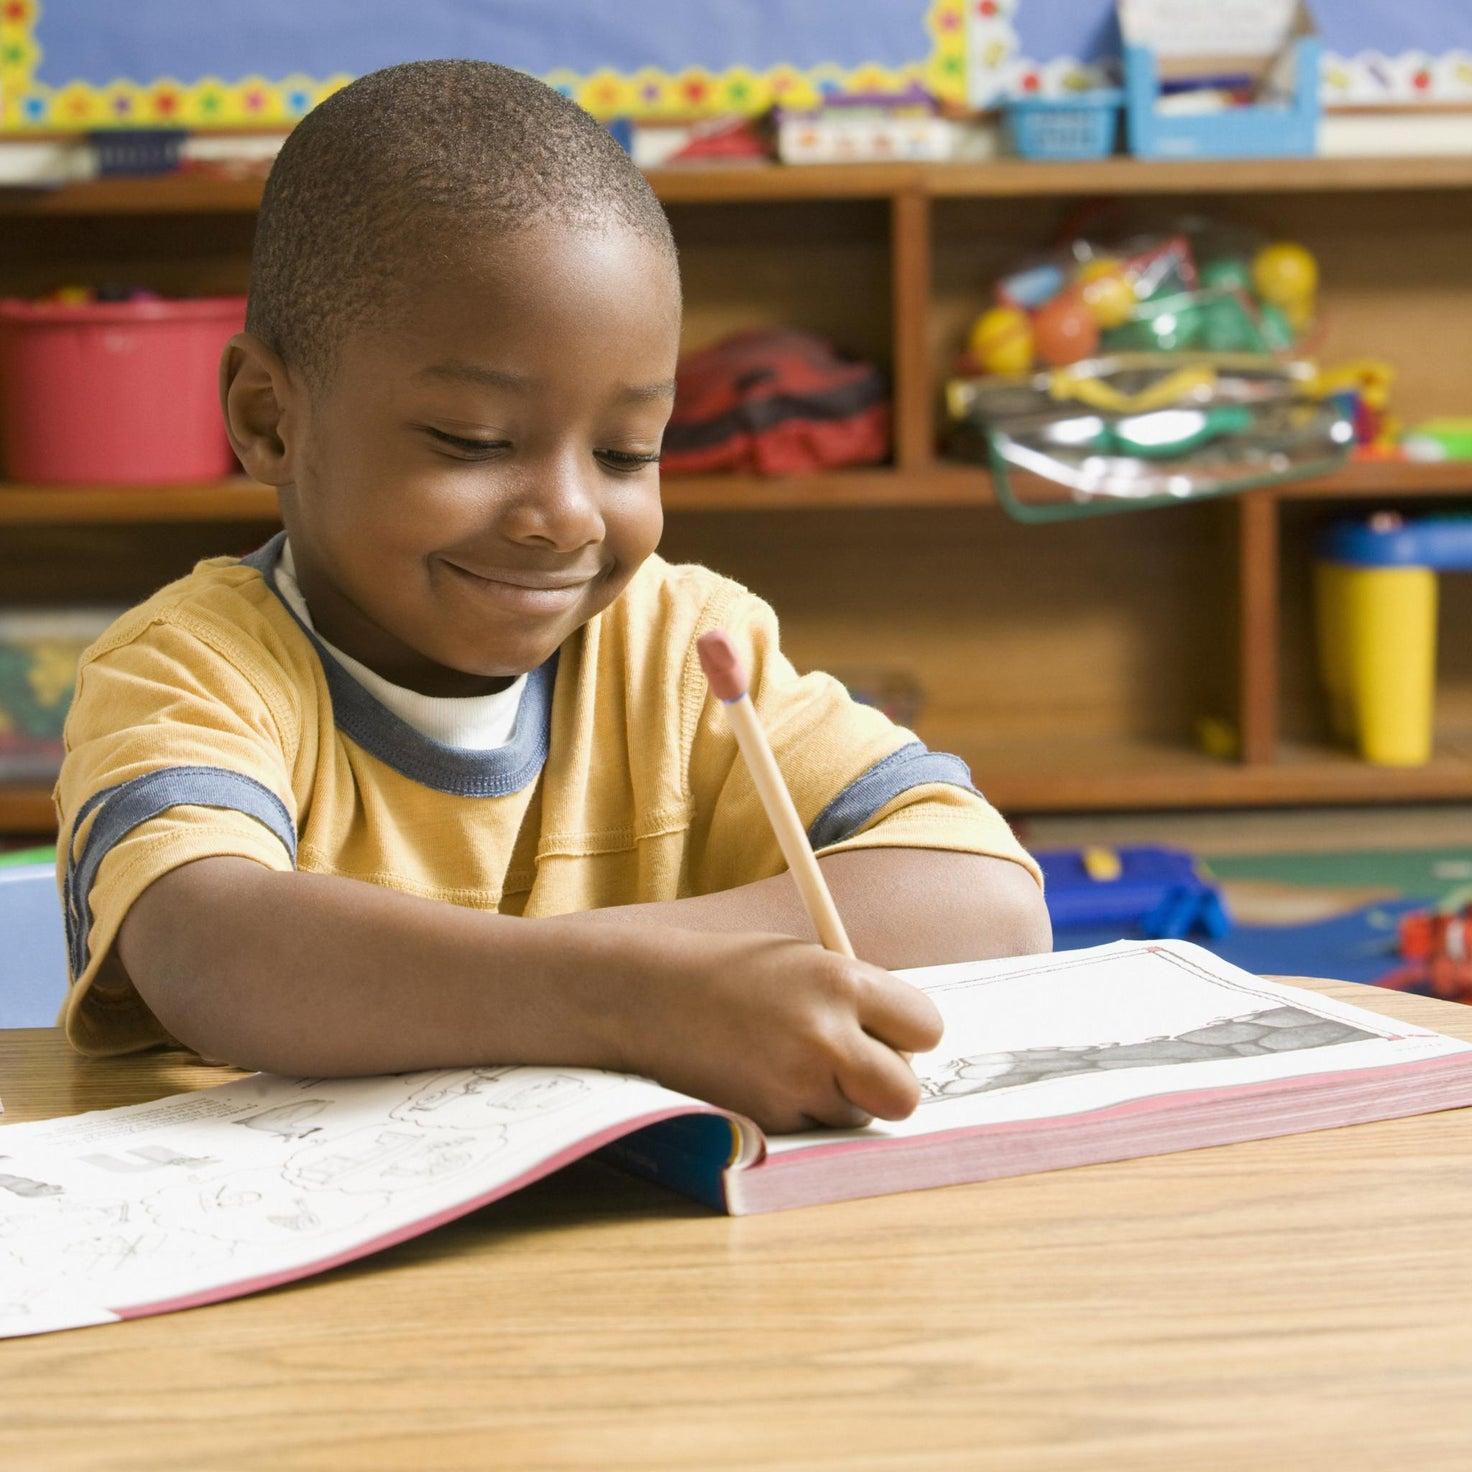 5 Ways to Boost Your Child's Self Esteem